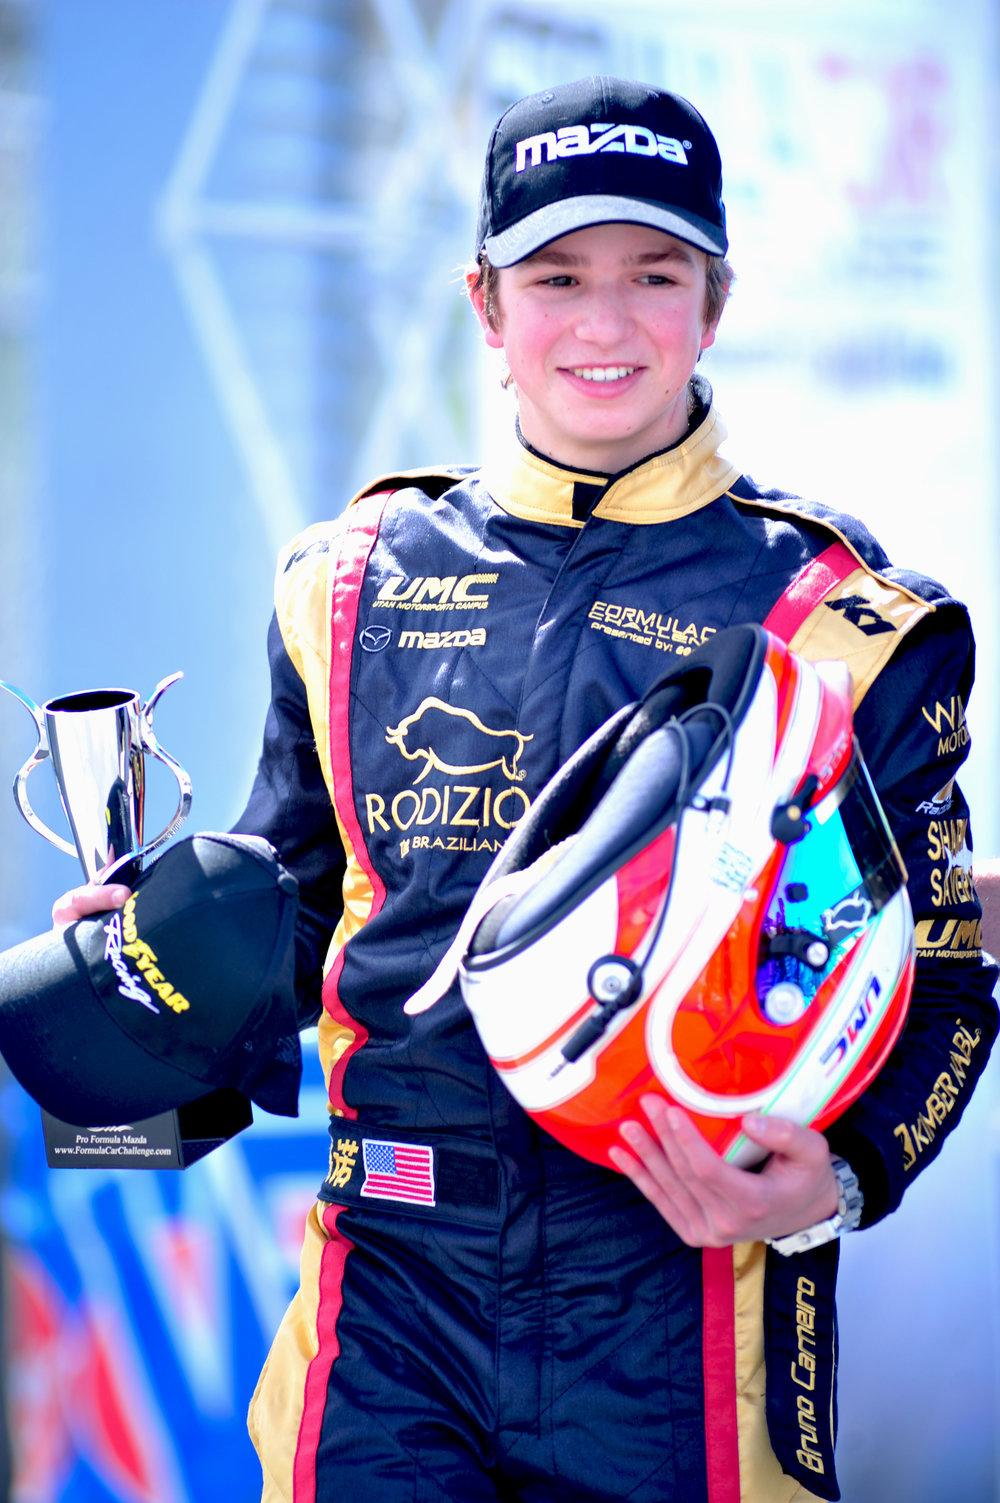 Bruno Carneiro podium celebrations during the 2016 Formula Car Challenge at Mazda Raceway Laguna Sec (Mar.2016)